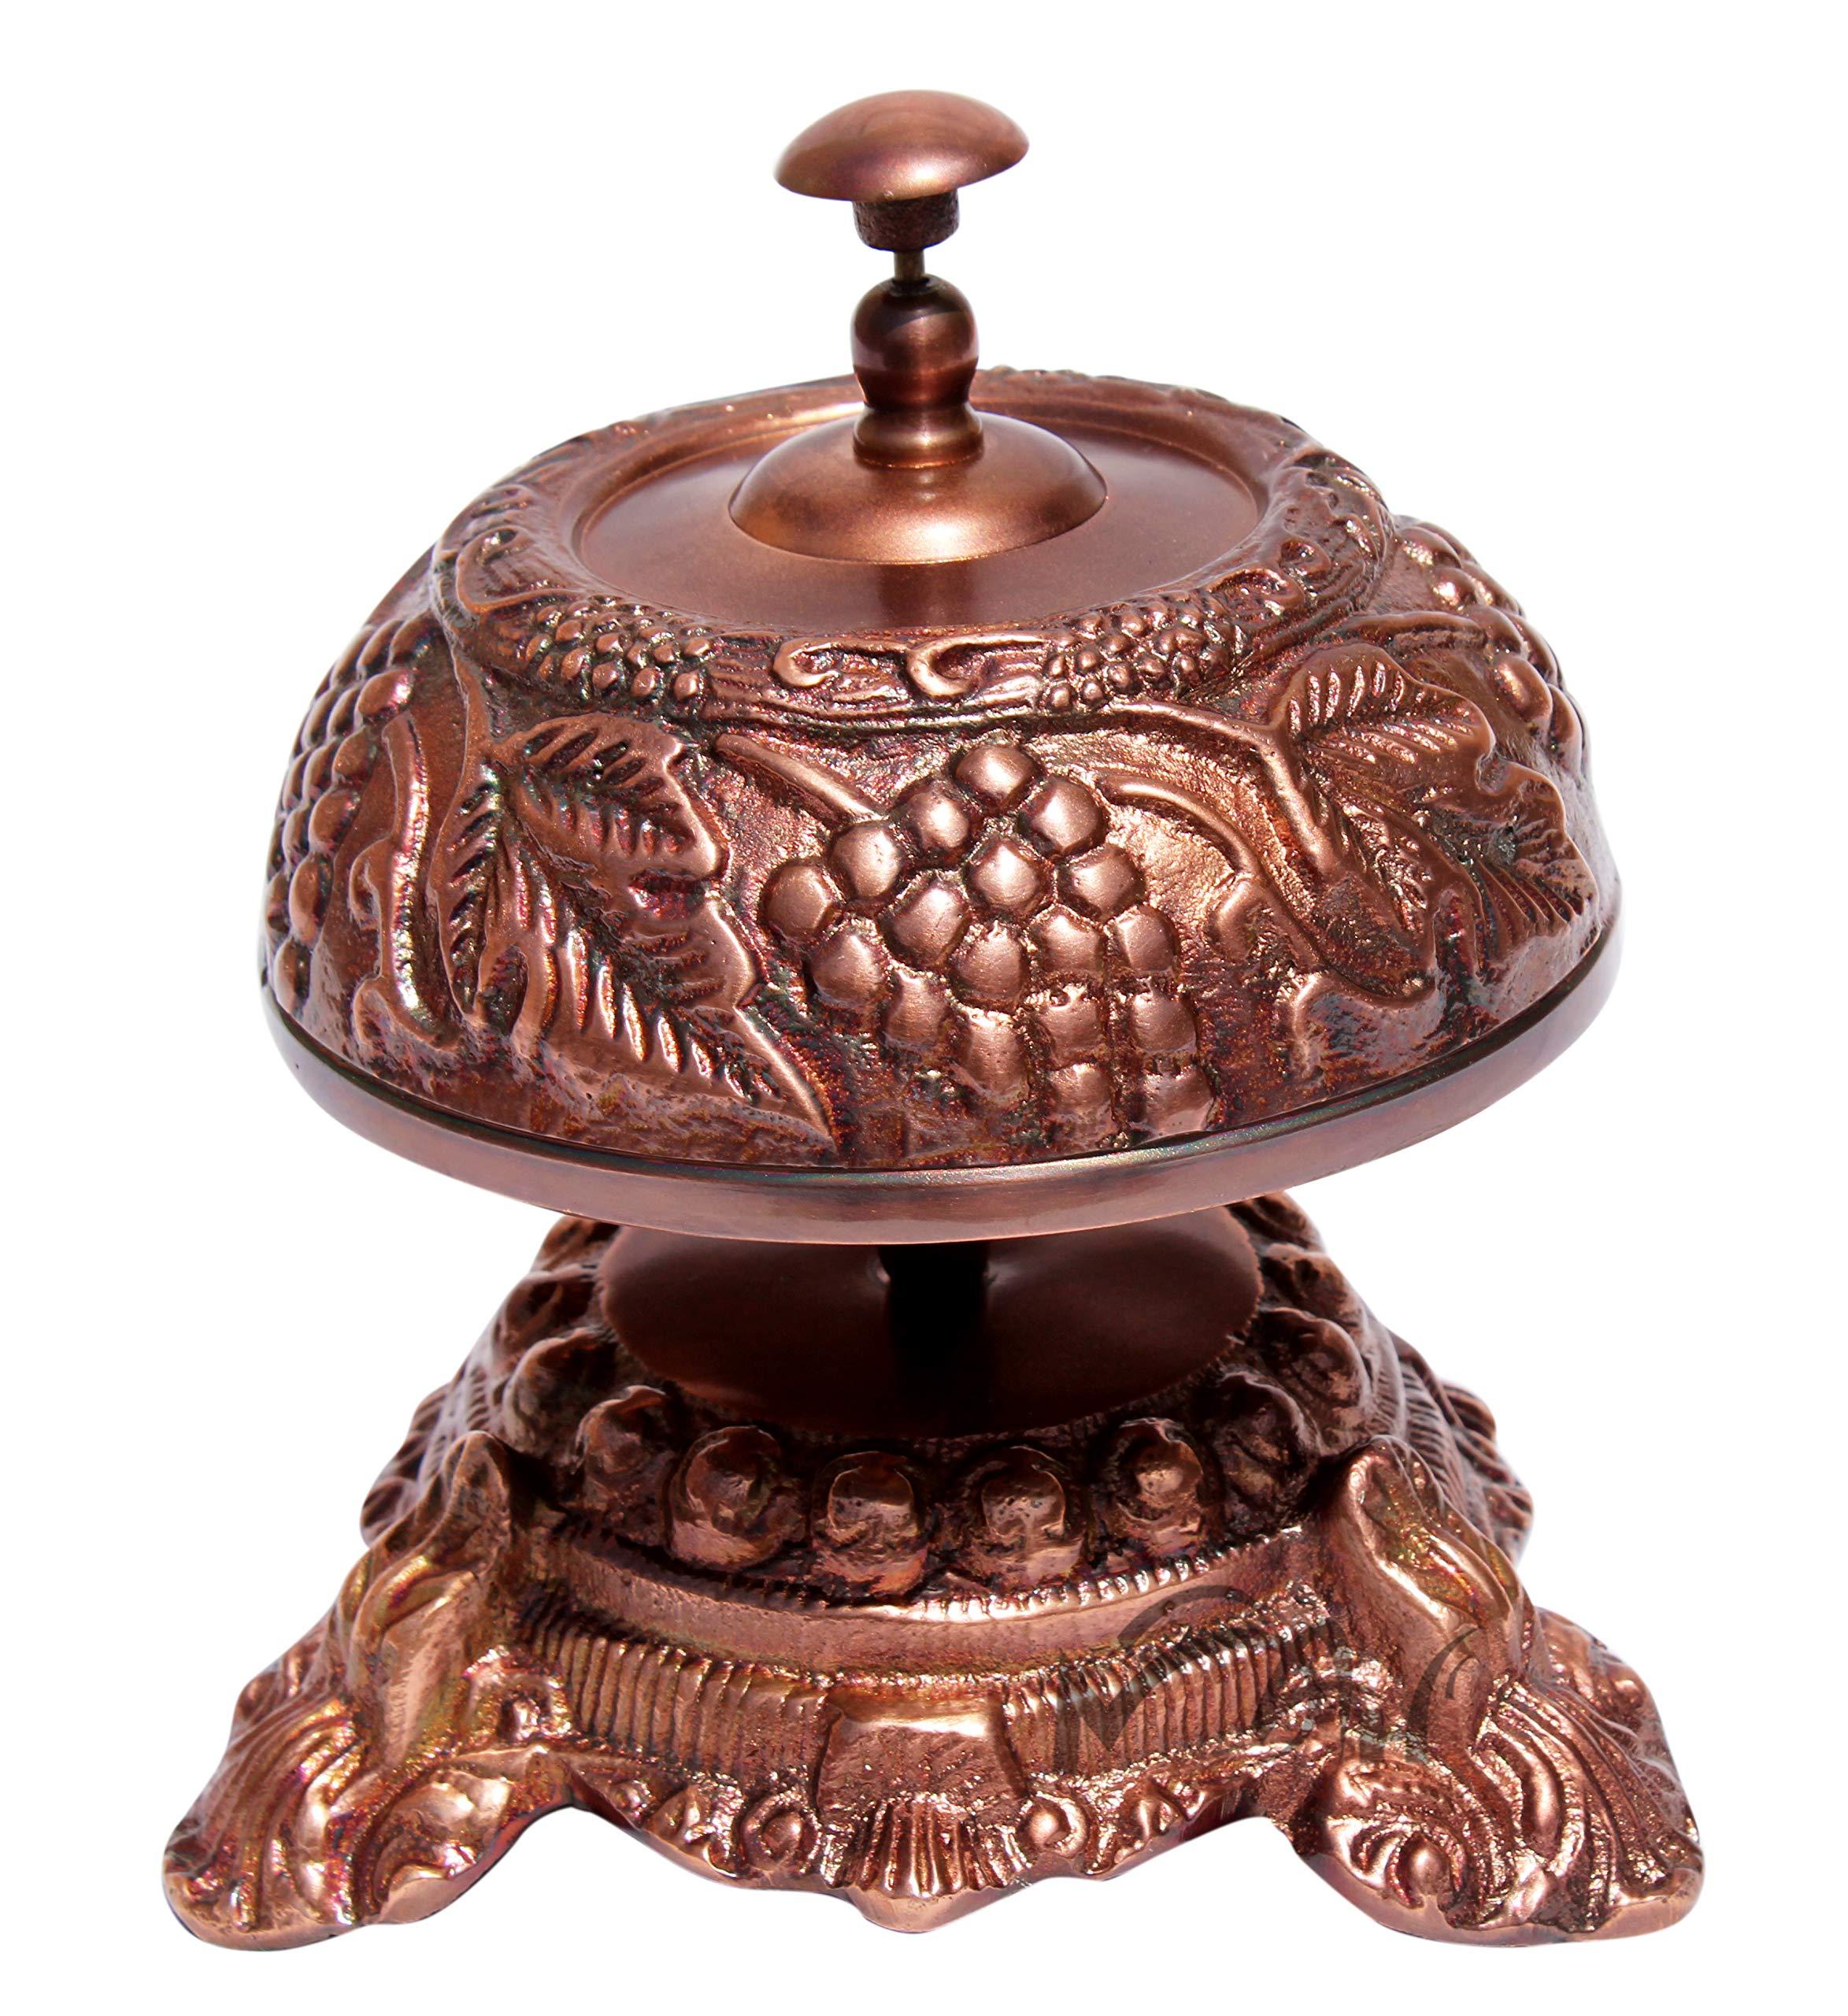 MAH Nautical -Solid Aluminum Beautiful Desk Bells Wine Unique Table Bells Home Decor Gift Call Bell Reception Bell (Grapevine, Copper Antique) C-3063